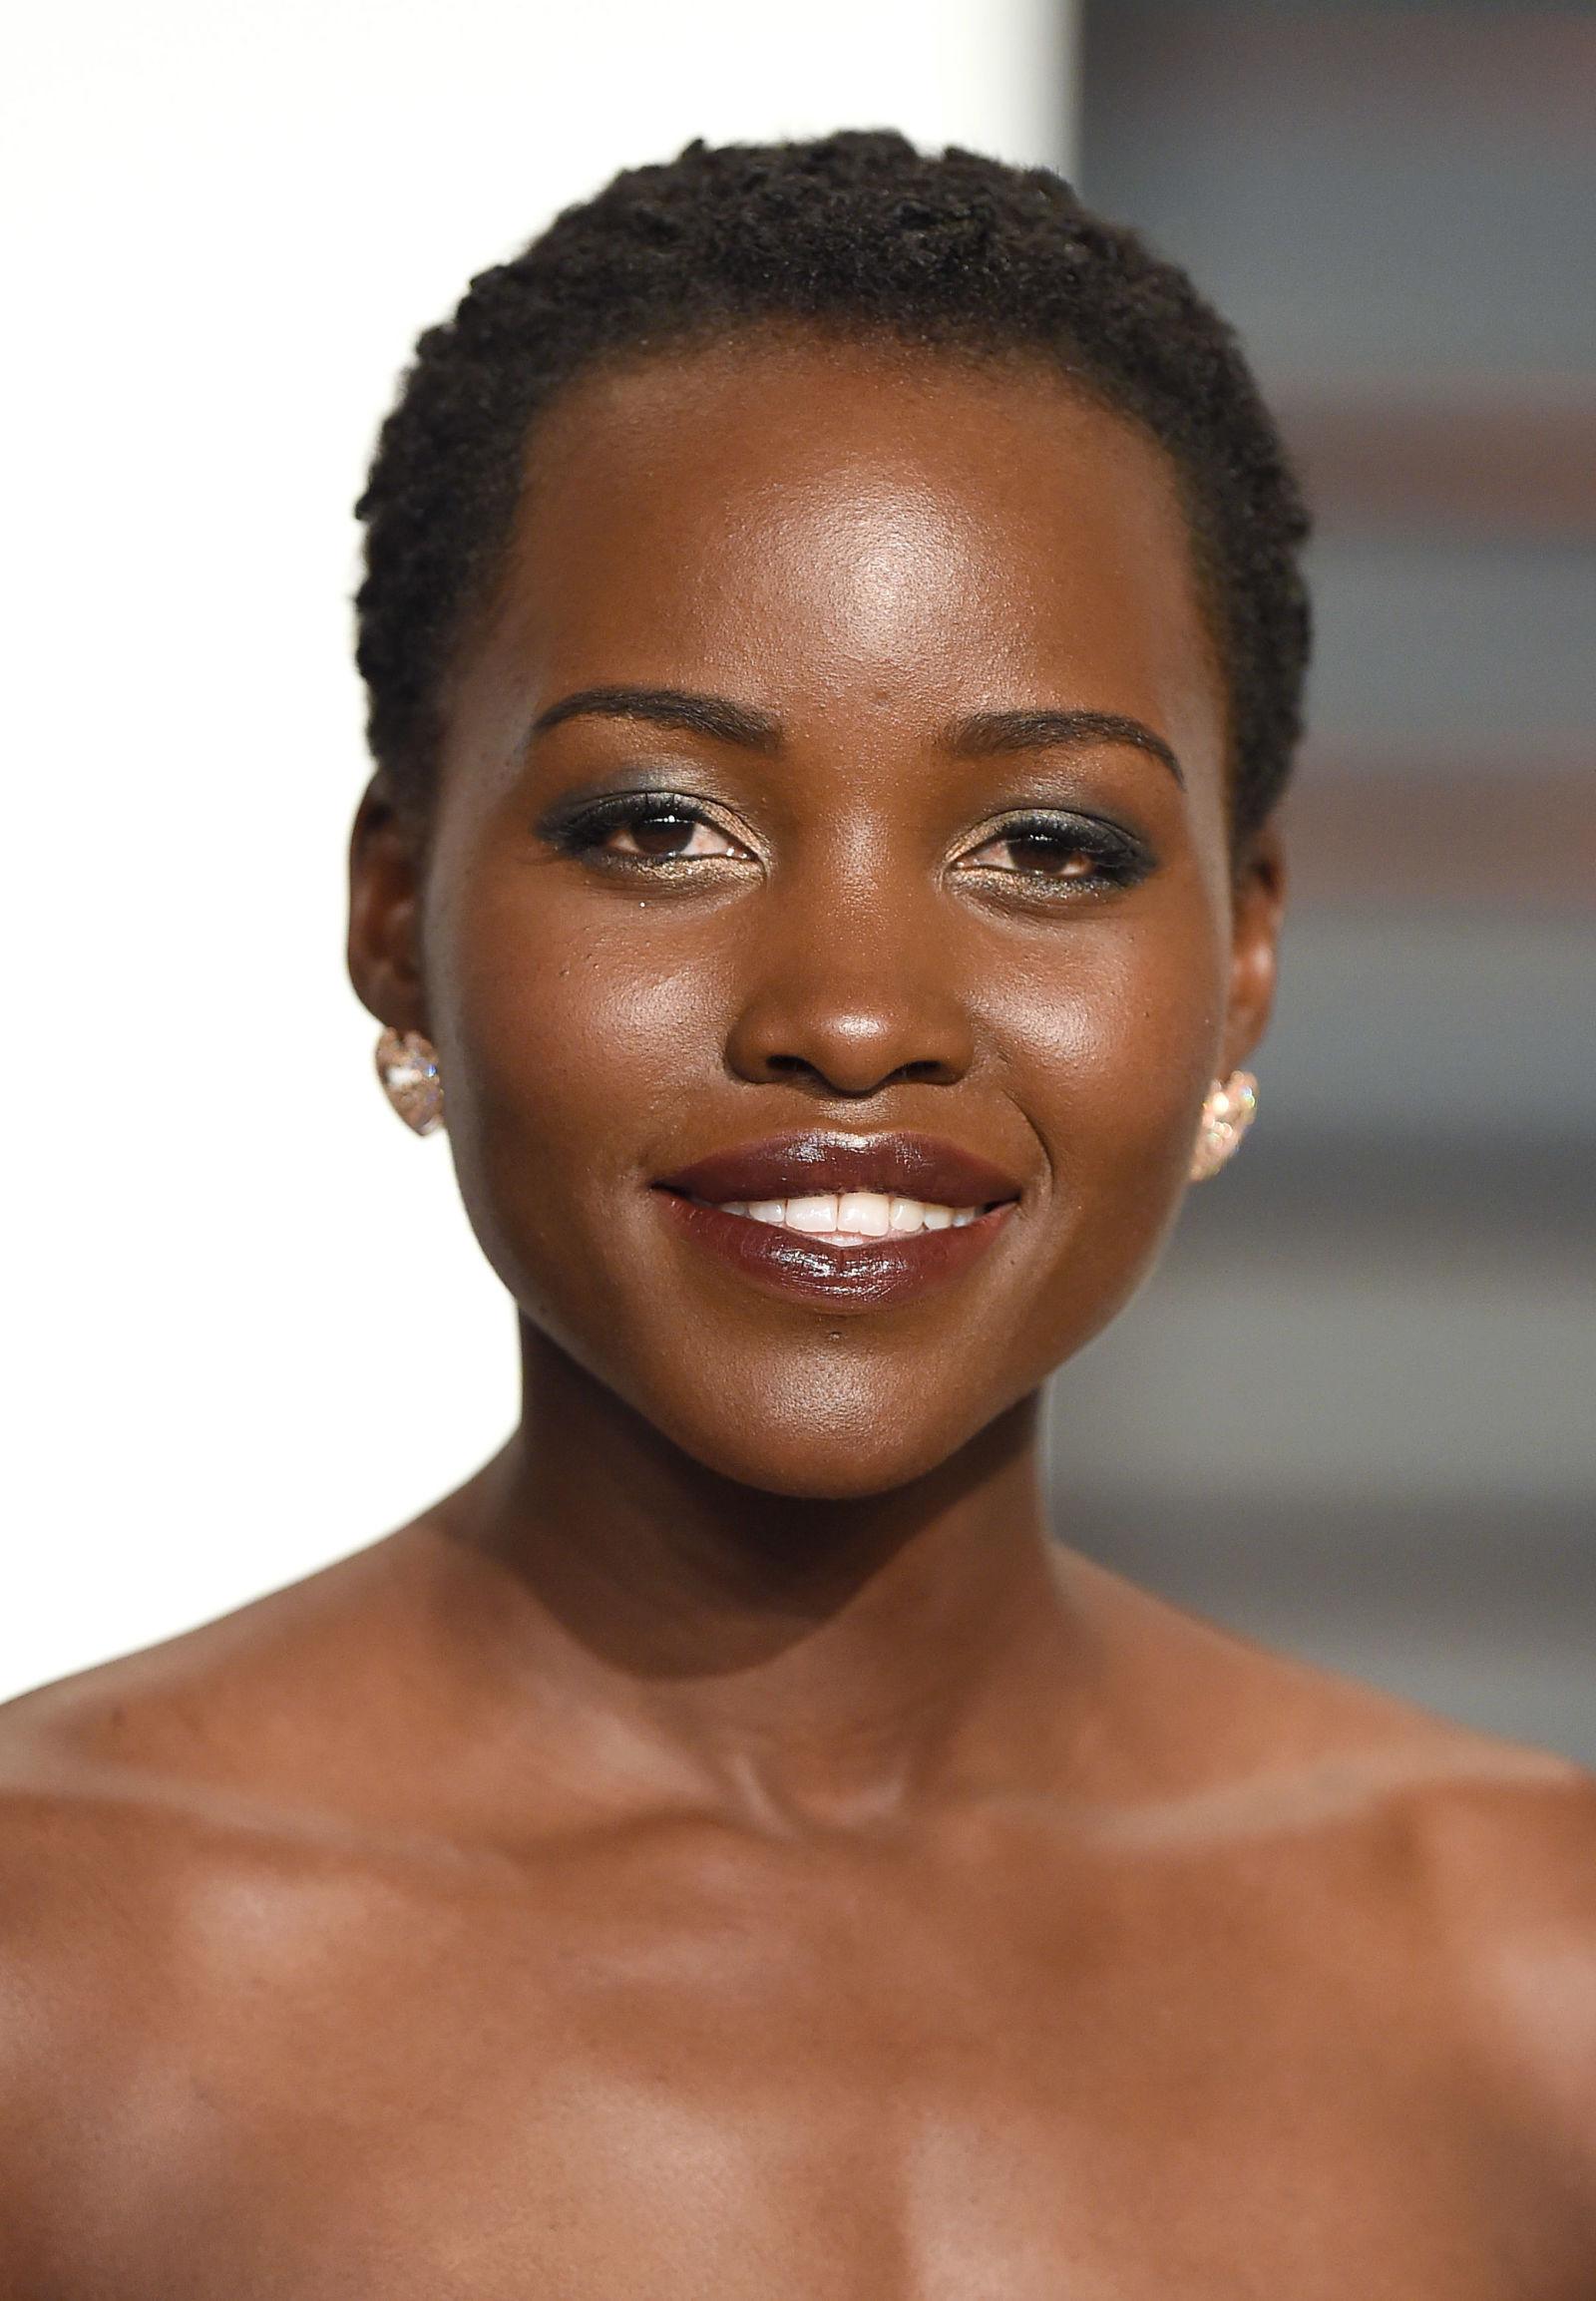 Astonishing Jazzy Black Women Short Hairstyles 2016 Hairstyles 2016 Hair Hairstyles For Men Maxibearus